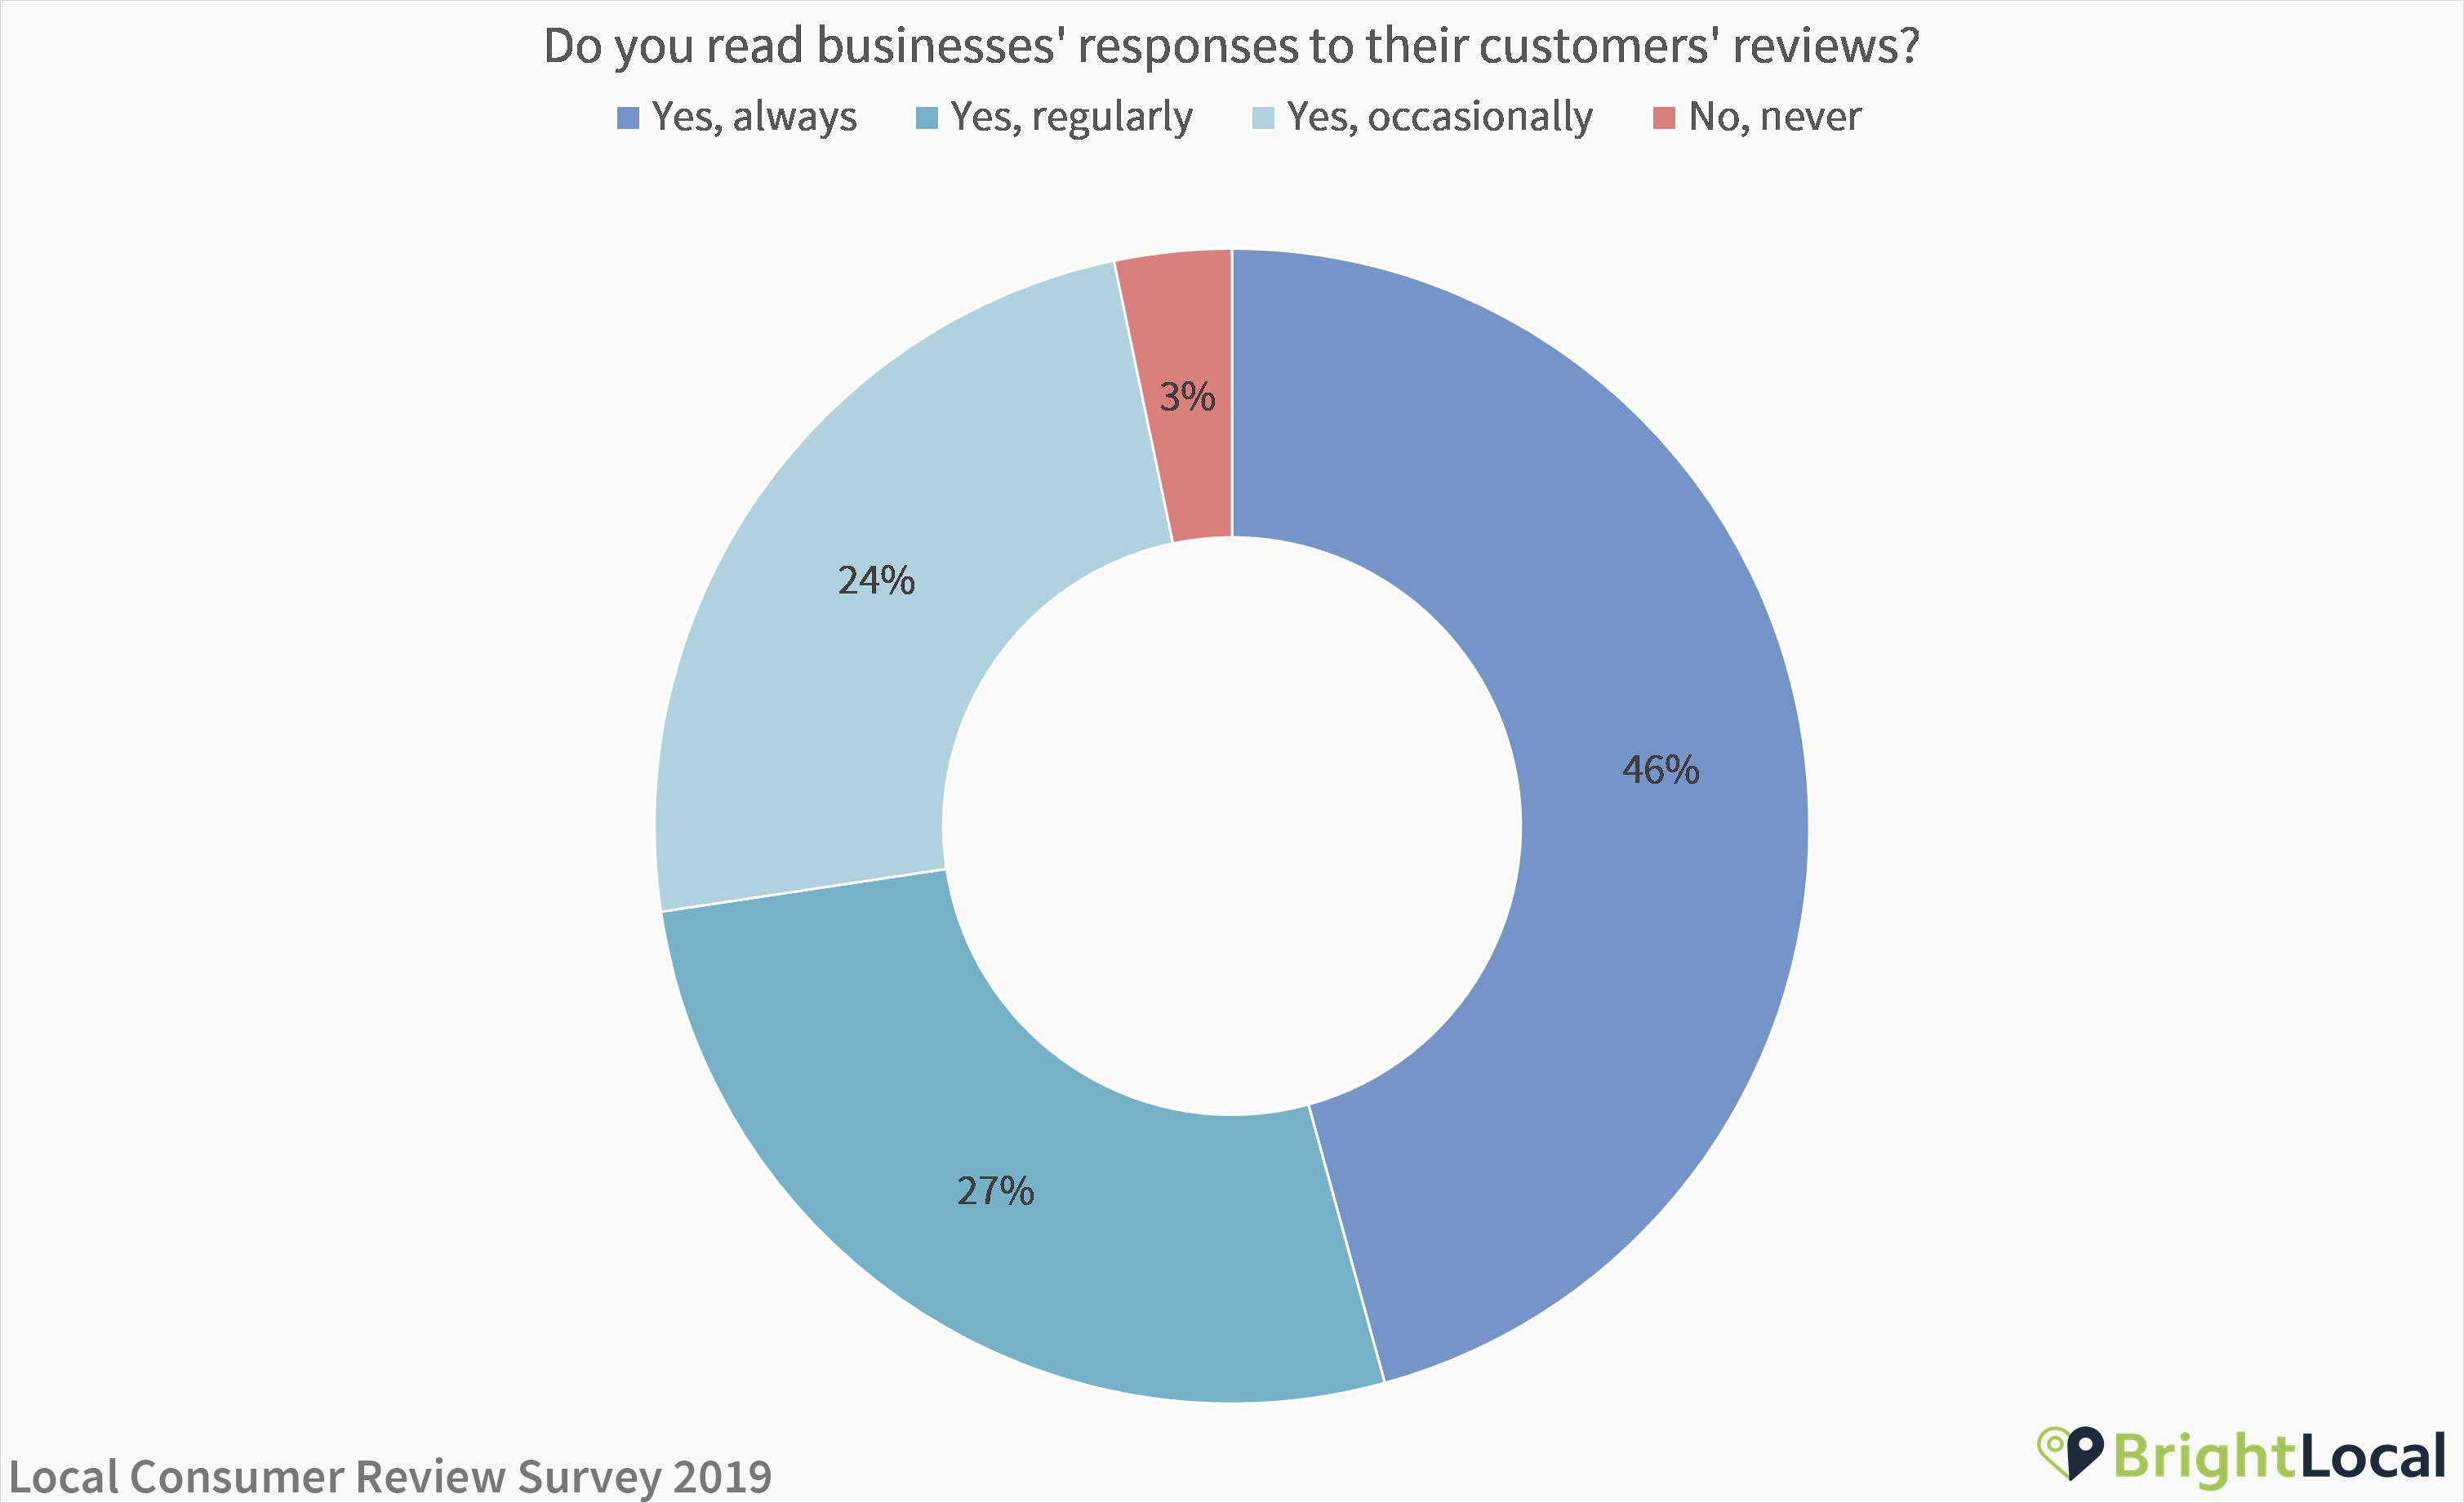 Do you read businesses' responses to reviews